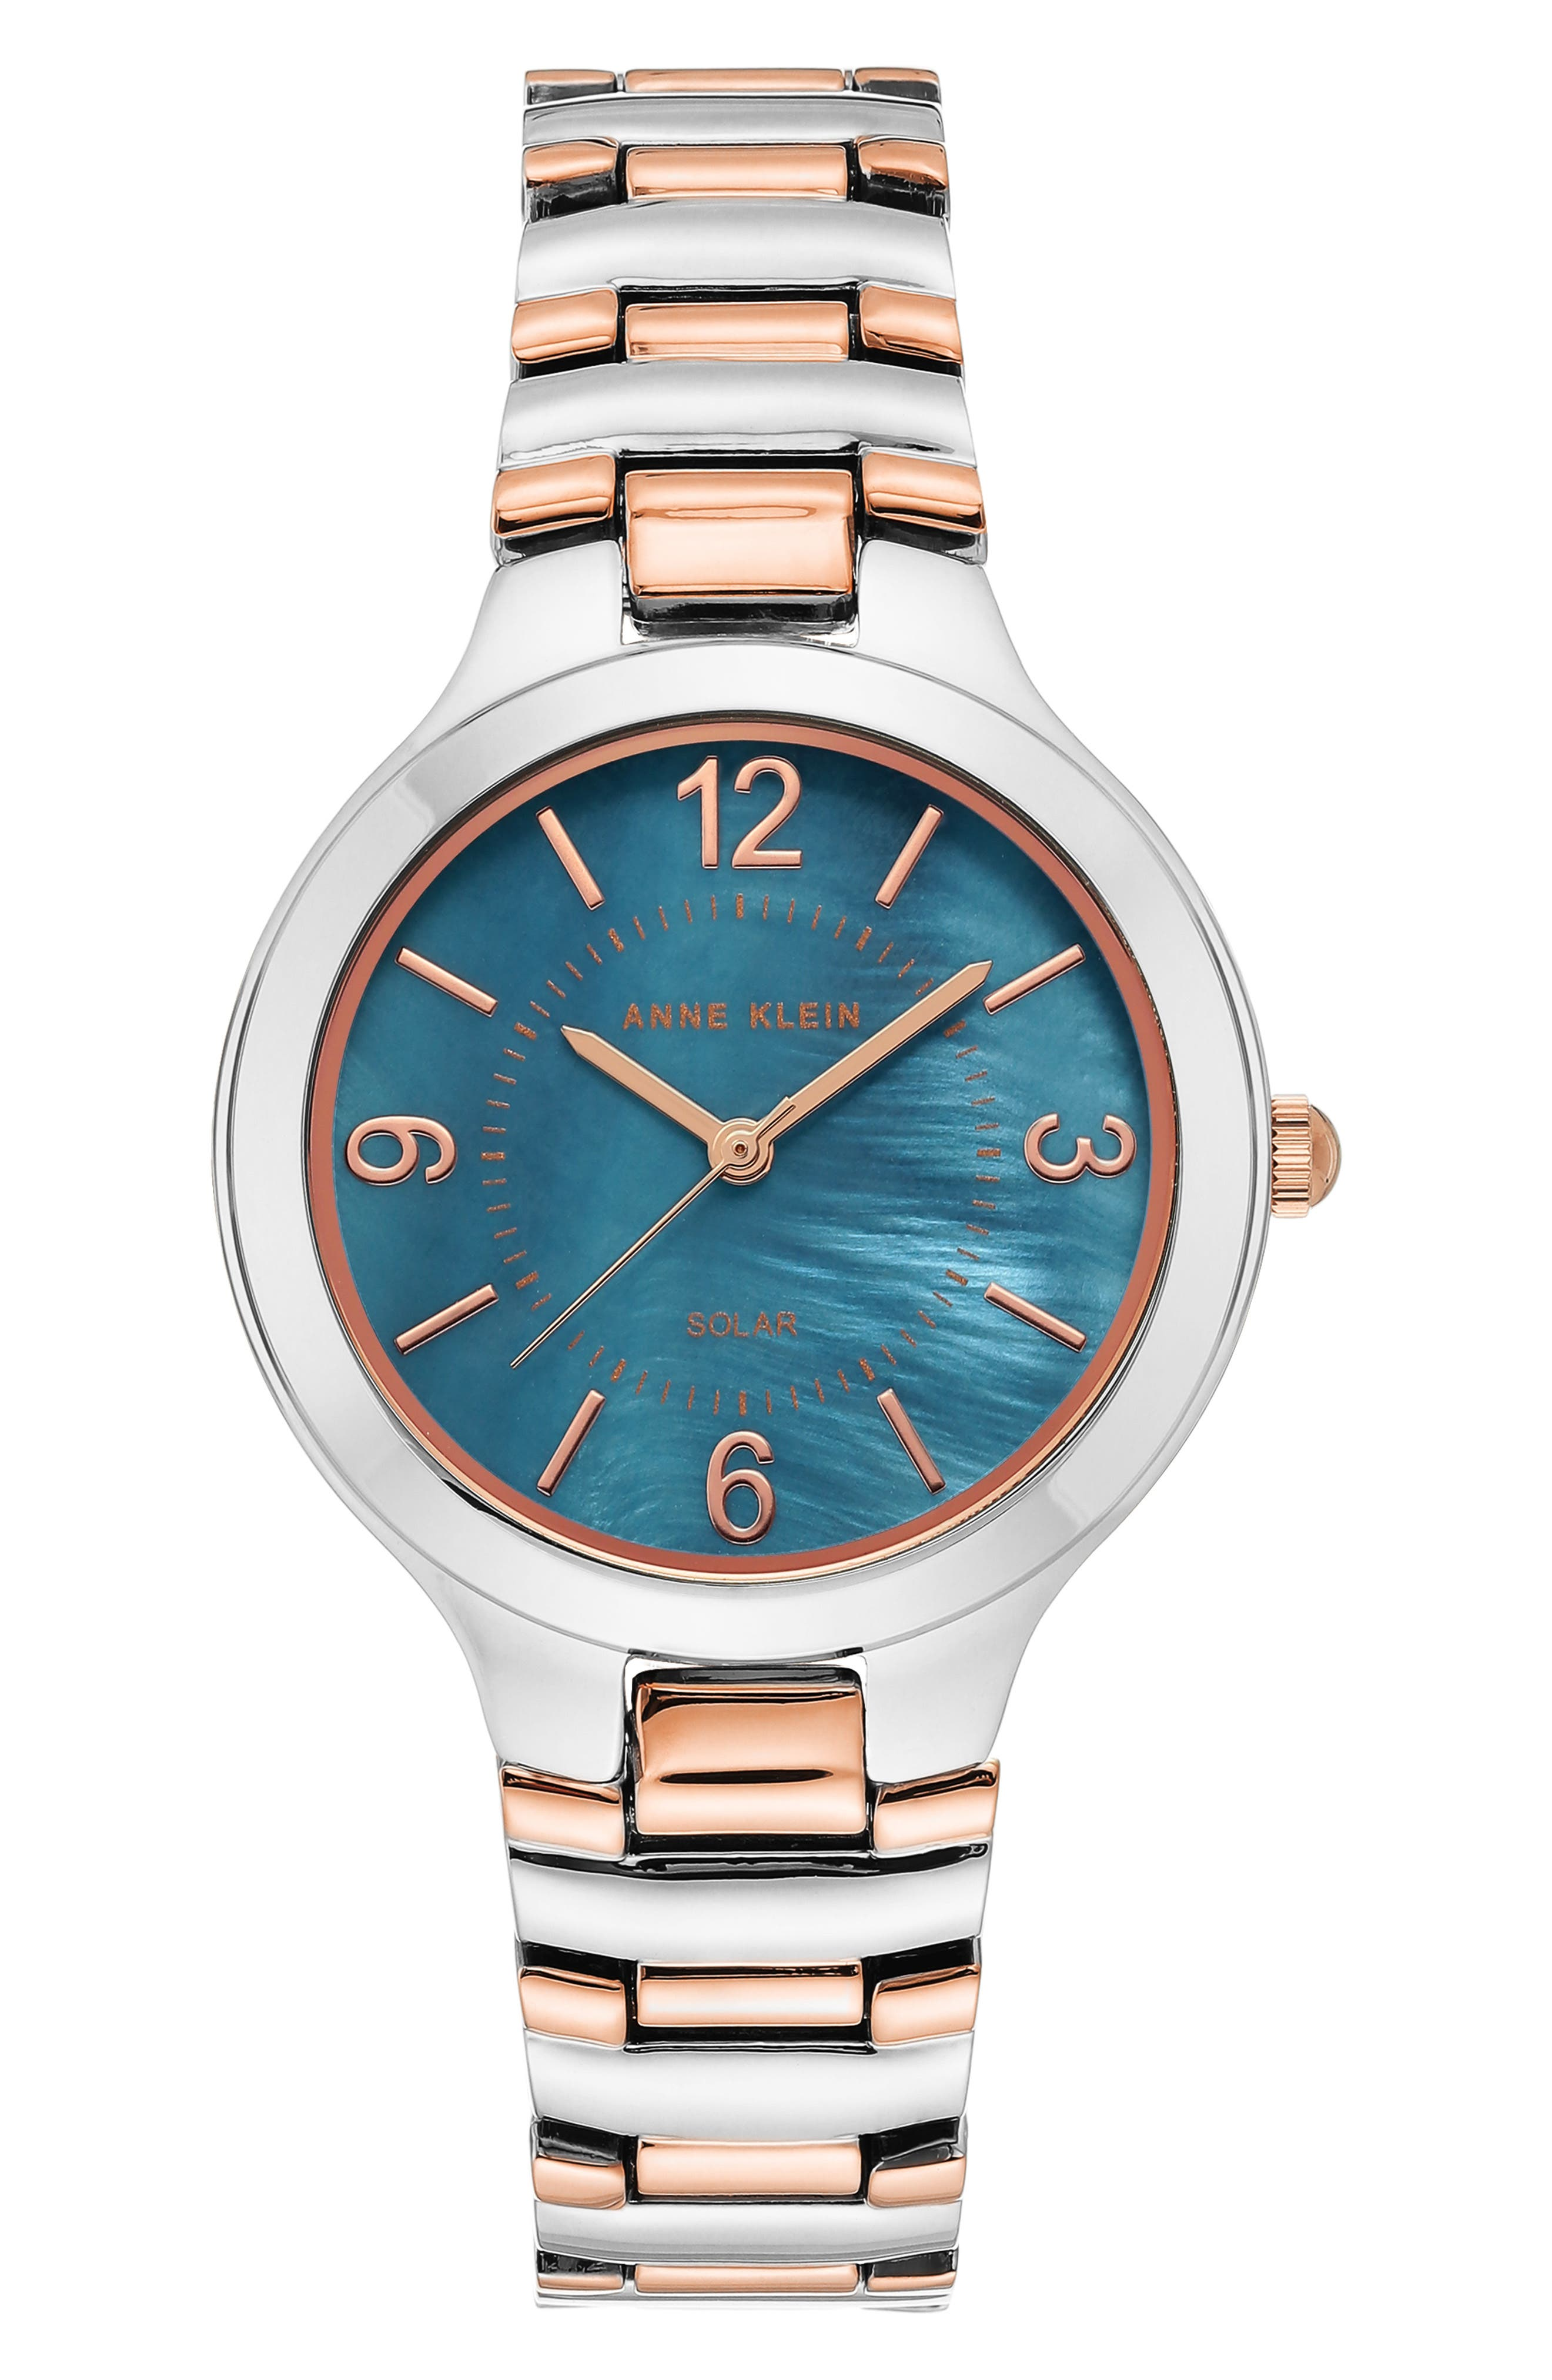 Considered Solar Power Bracelet Watch